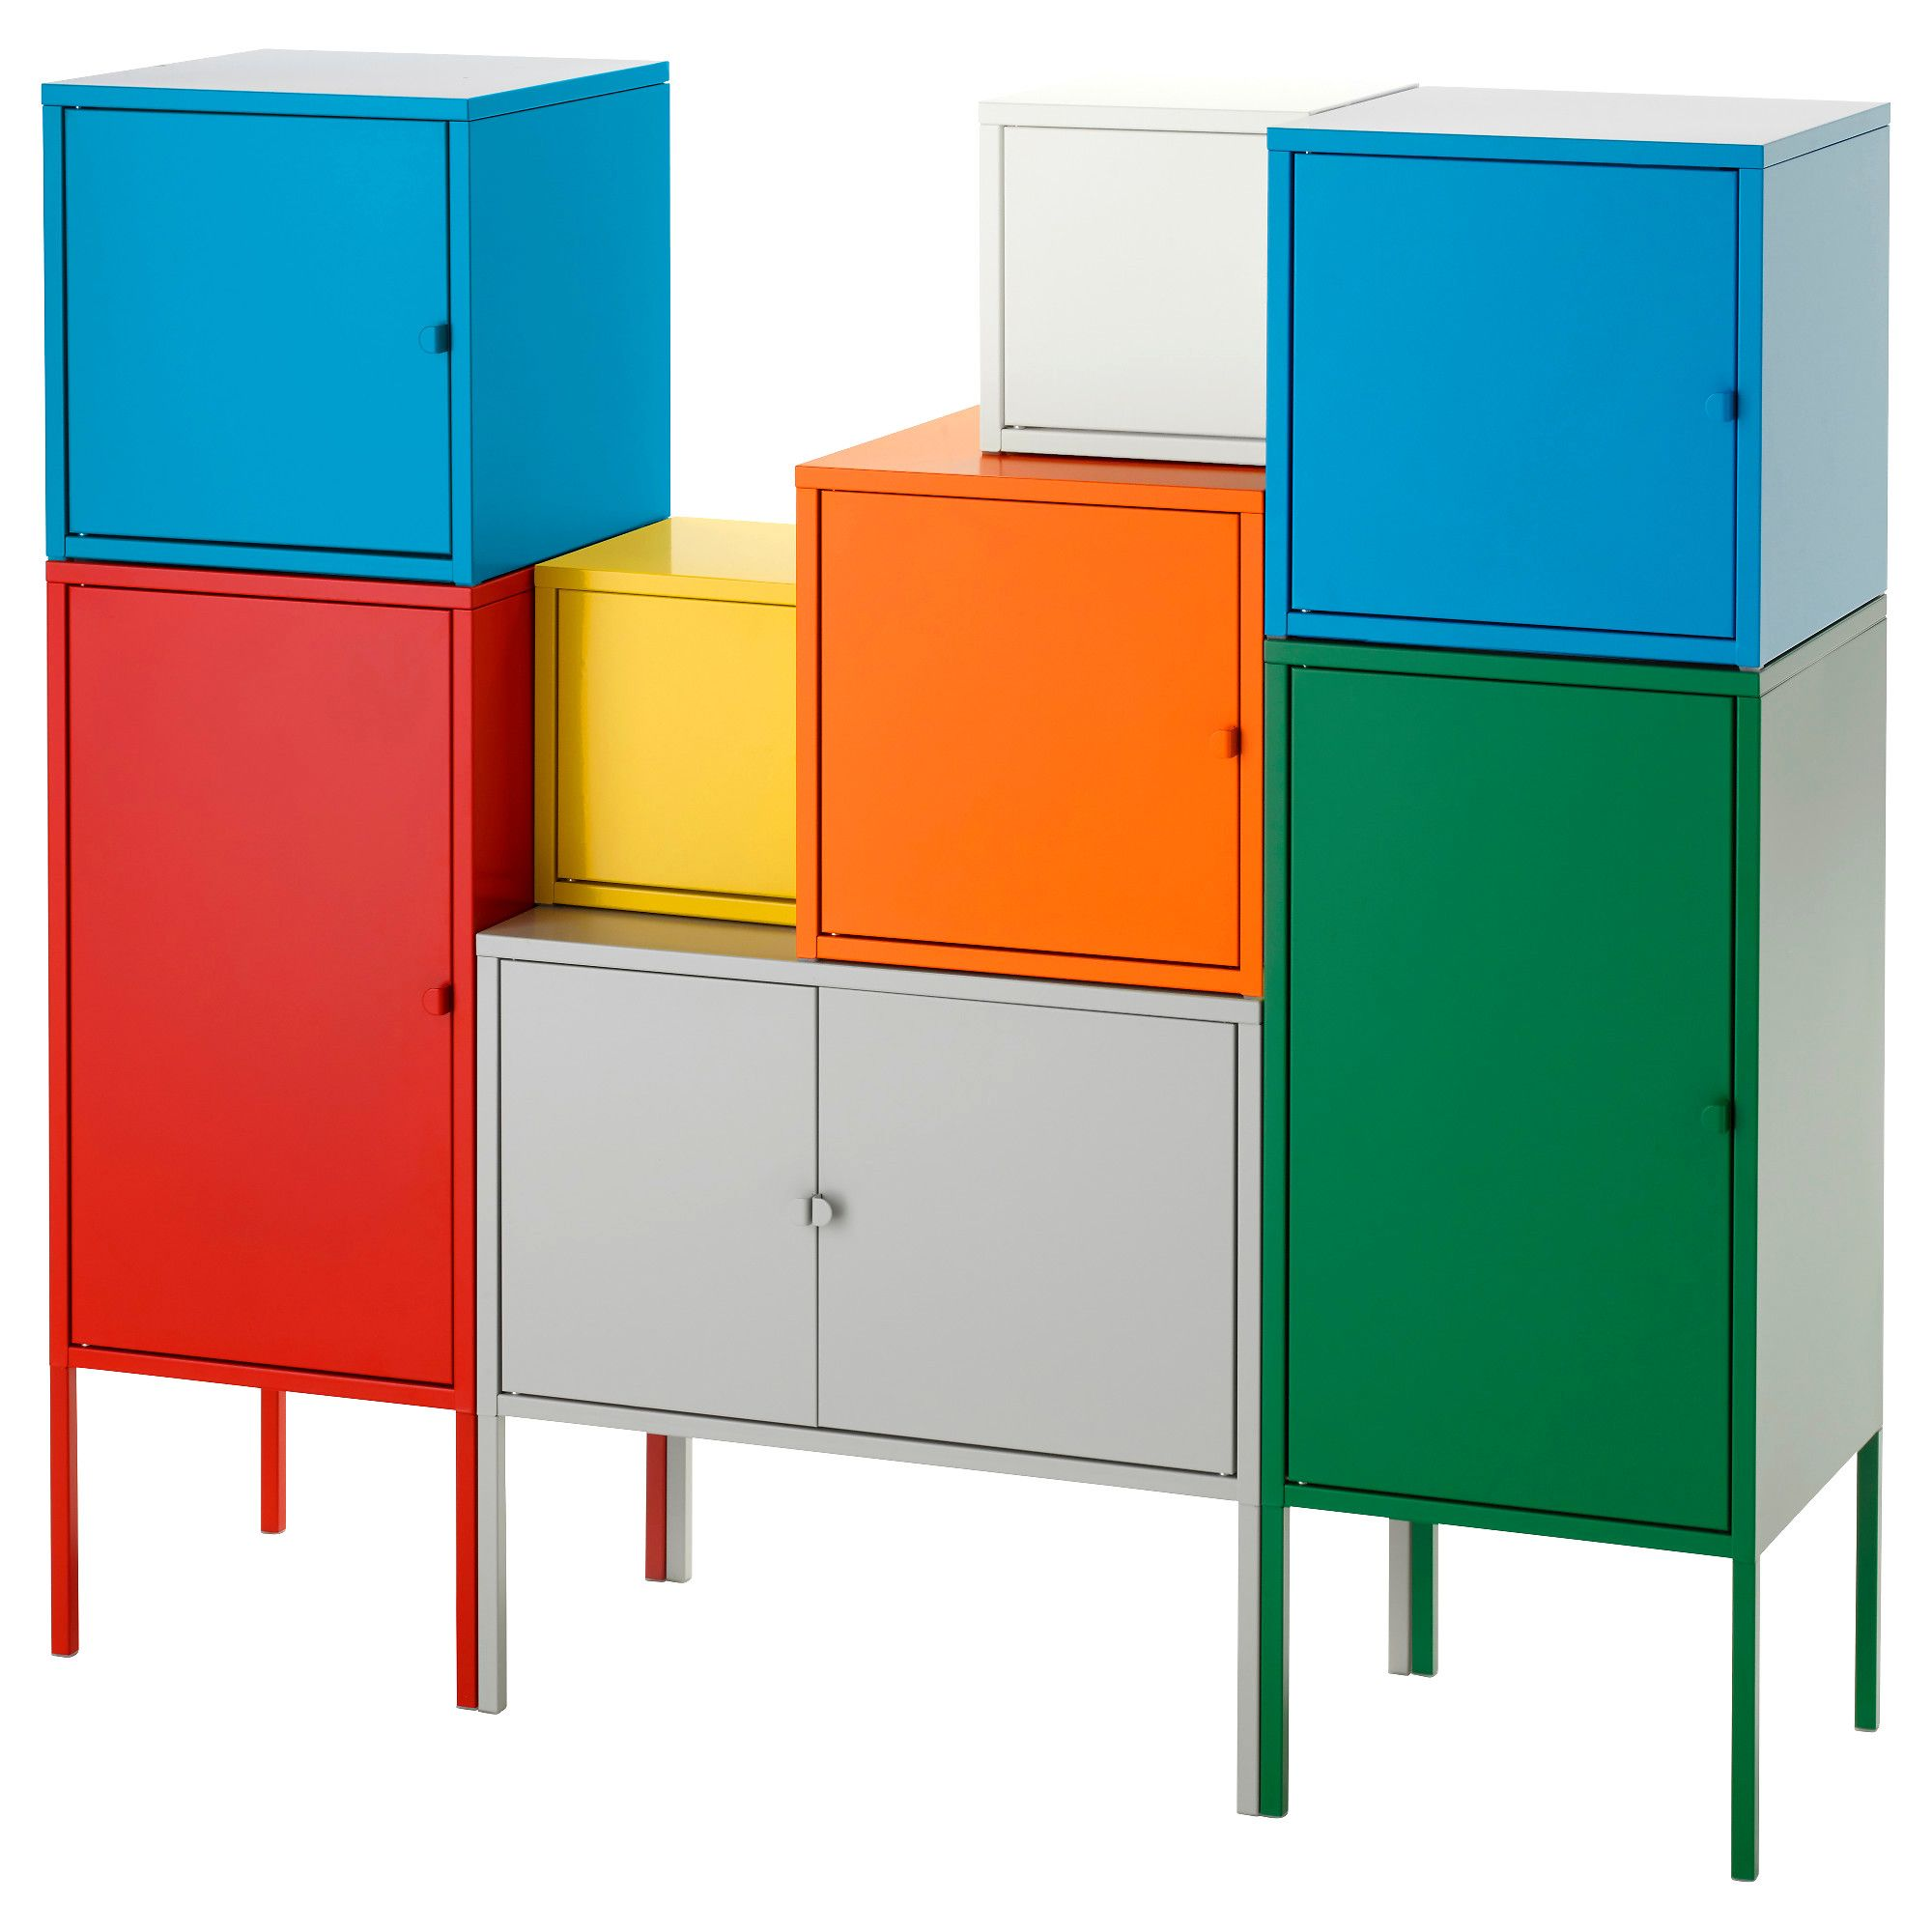 Image result for ikea lockers metallo Ikea, Cupboard